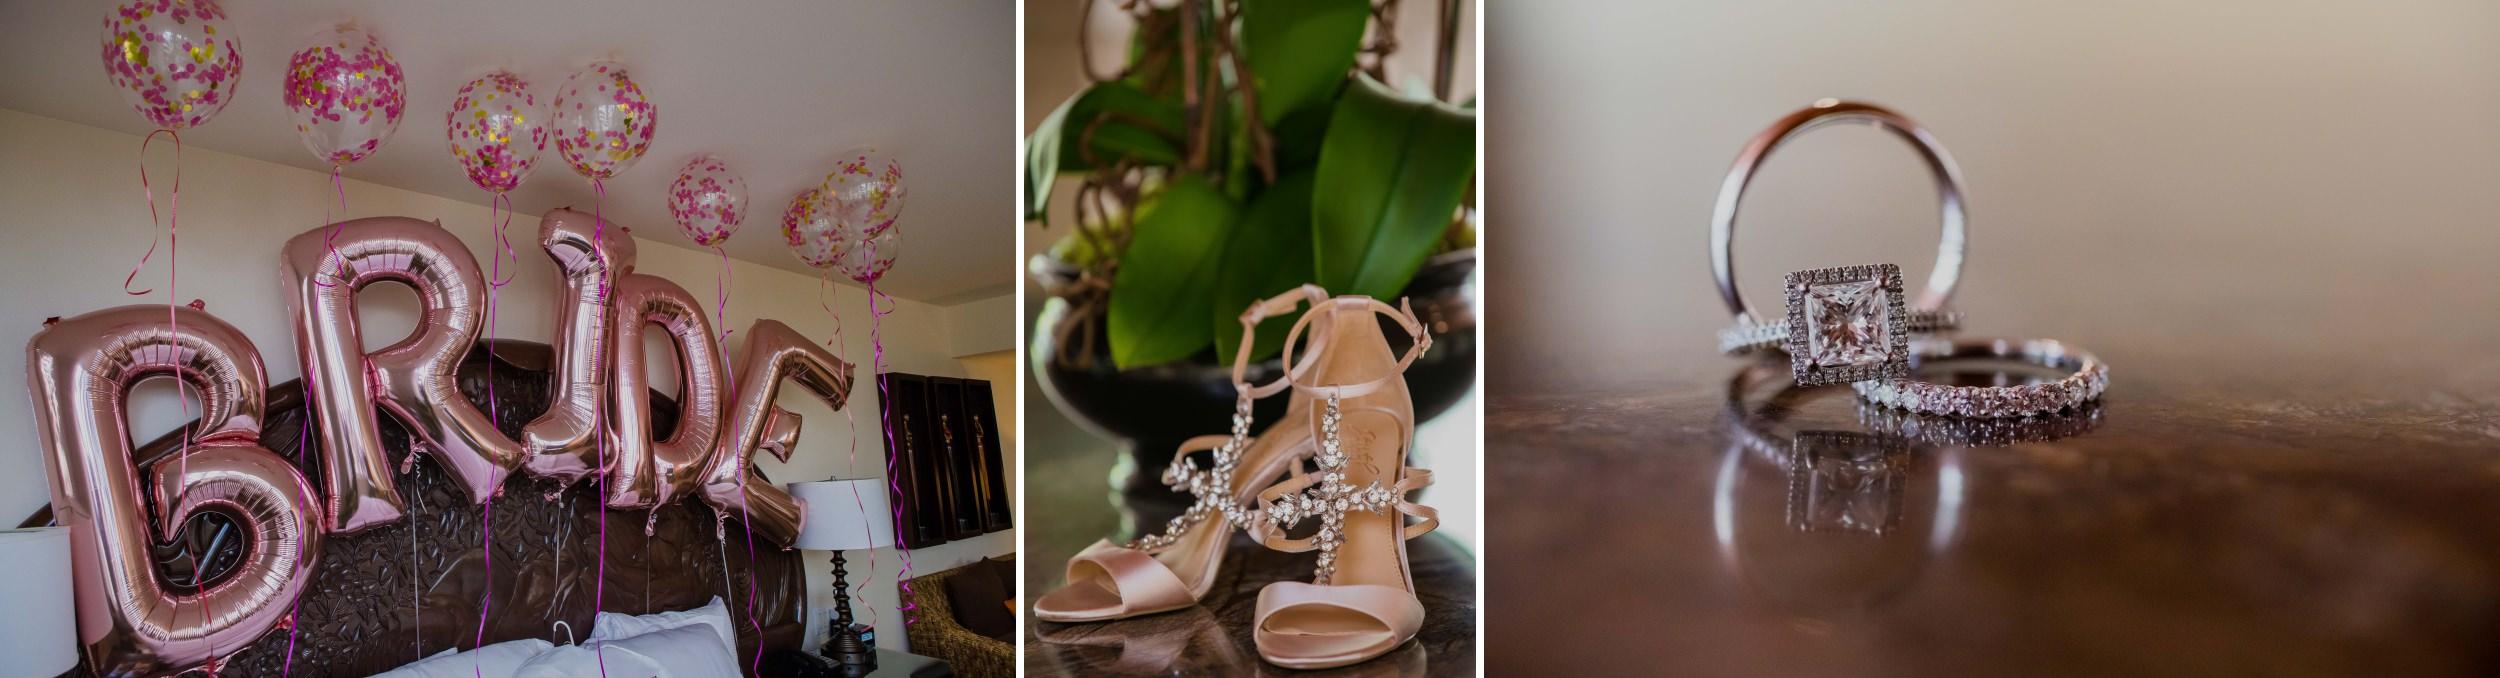 Wedding - Rusty Pelican - Key Biscayne - Santy Martinez Photography 1.jpg